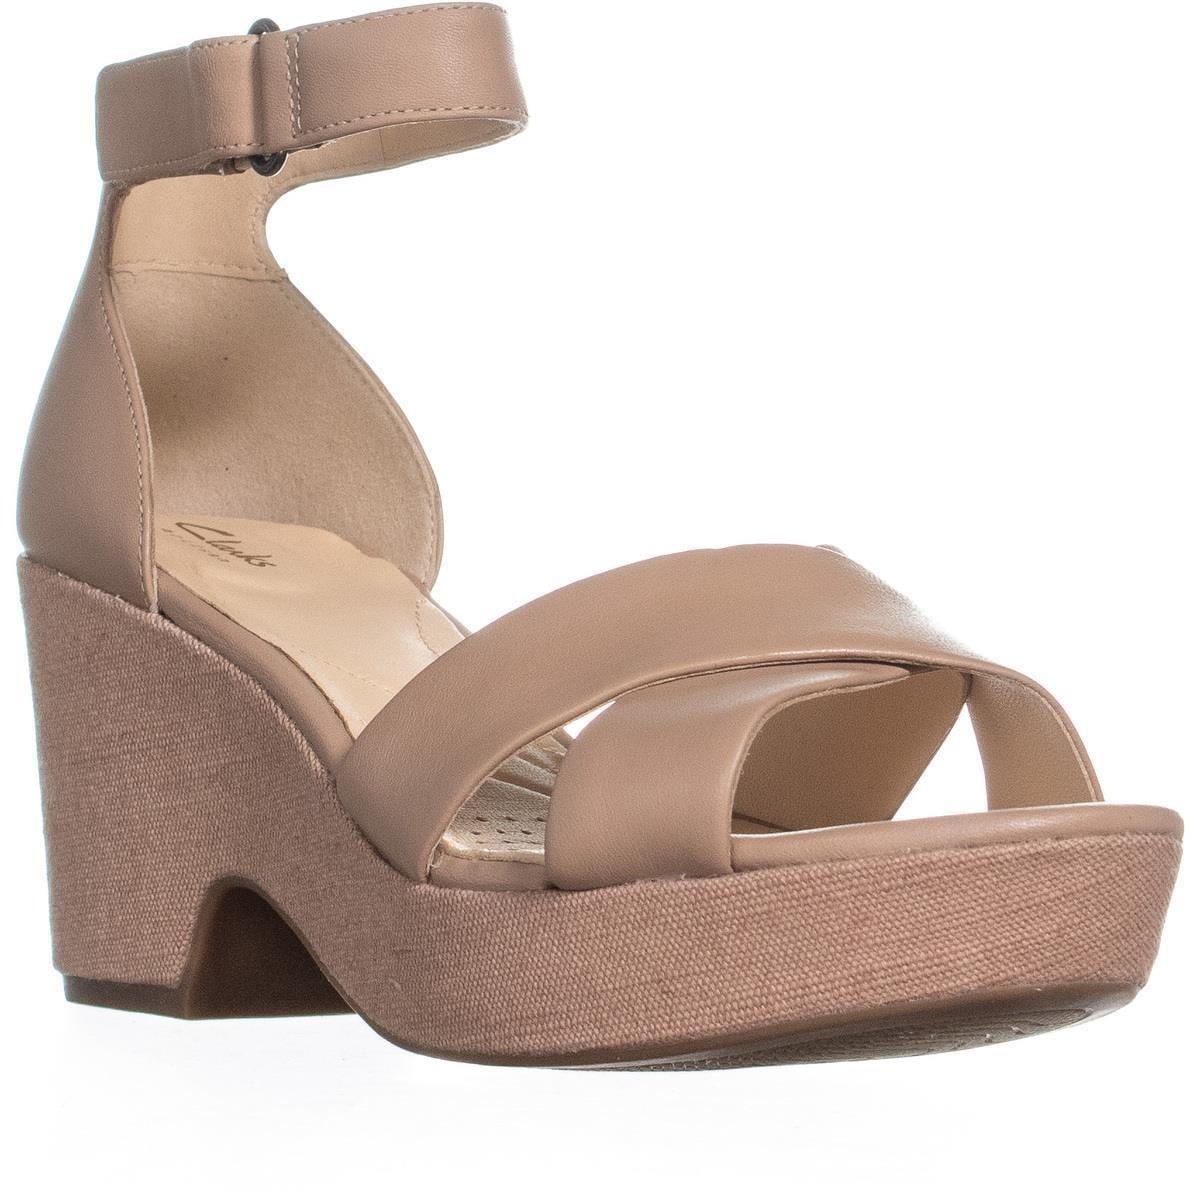 f8de502945c6 Shop Clarks Maritsa Ruth Platform Sandals